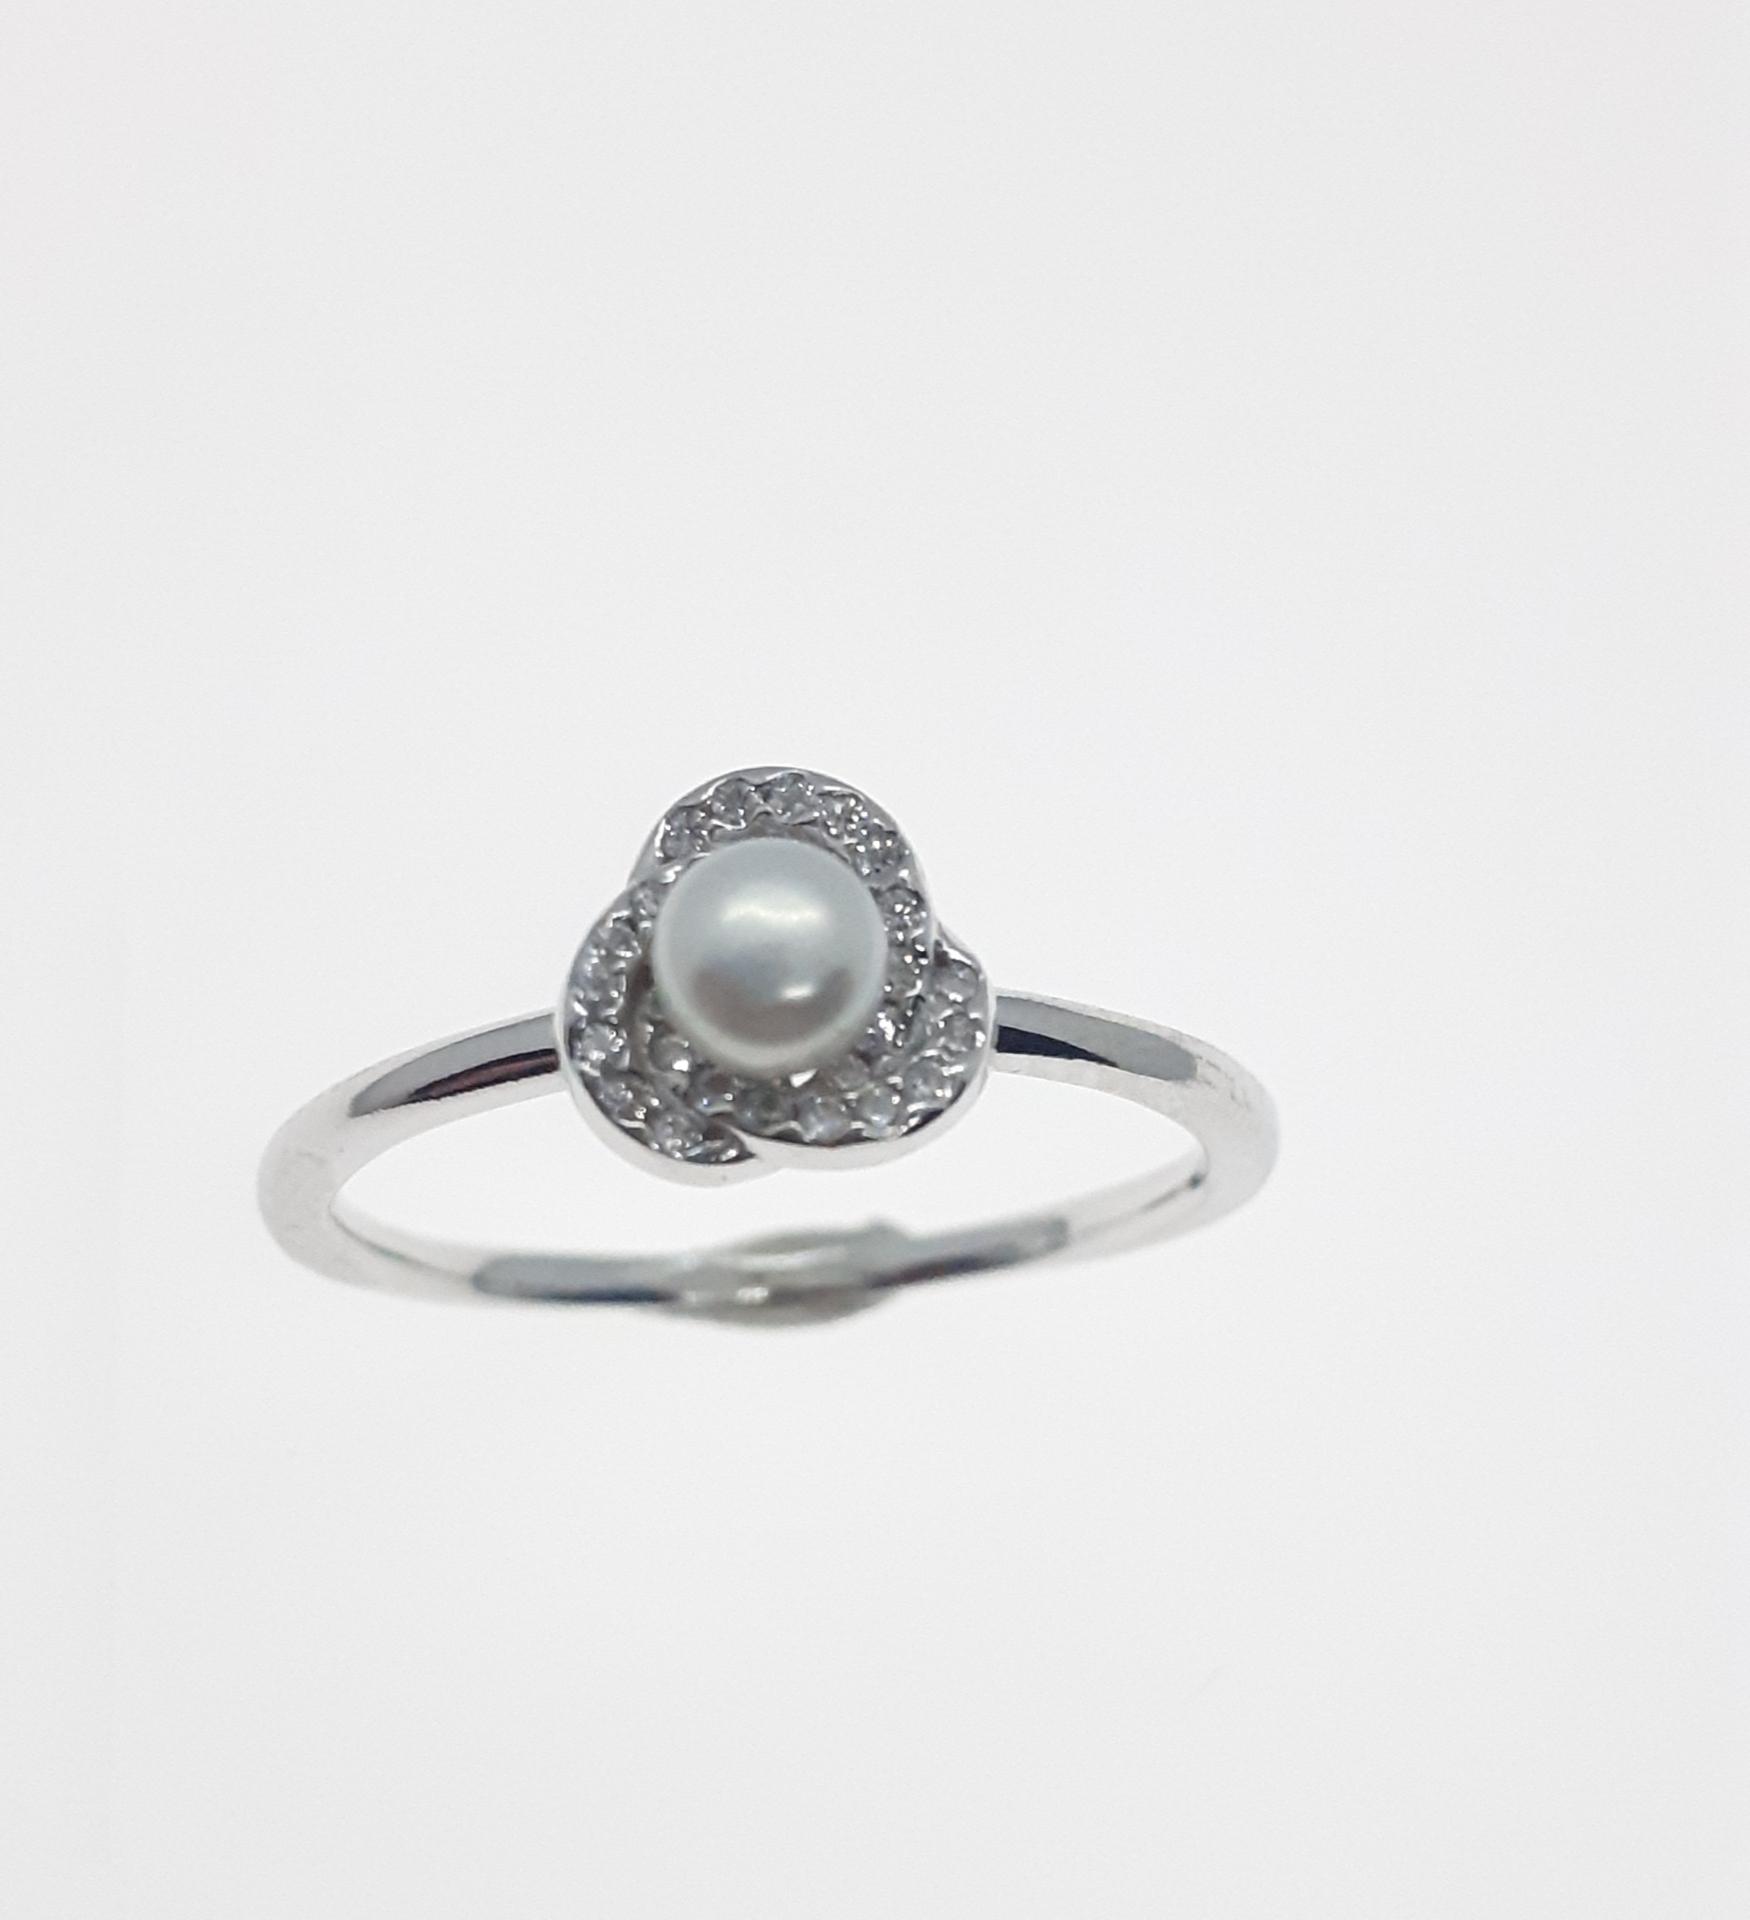 Sensi joyas jewellery Granada silver engagementSILVER AND ZIRCONIA RING